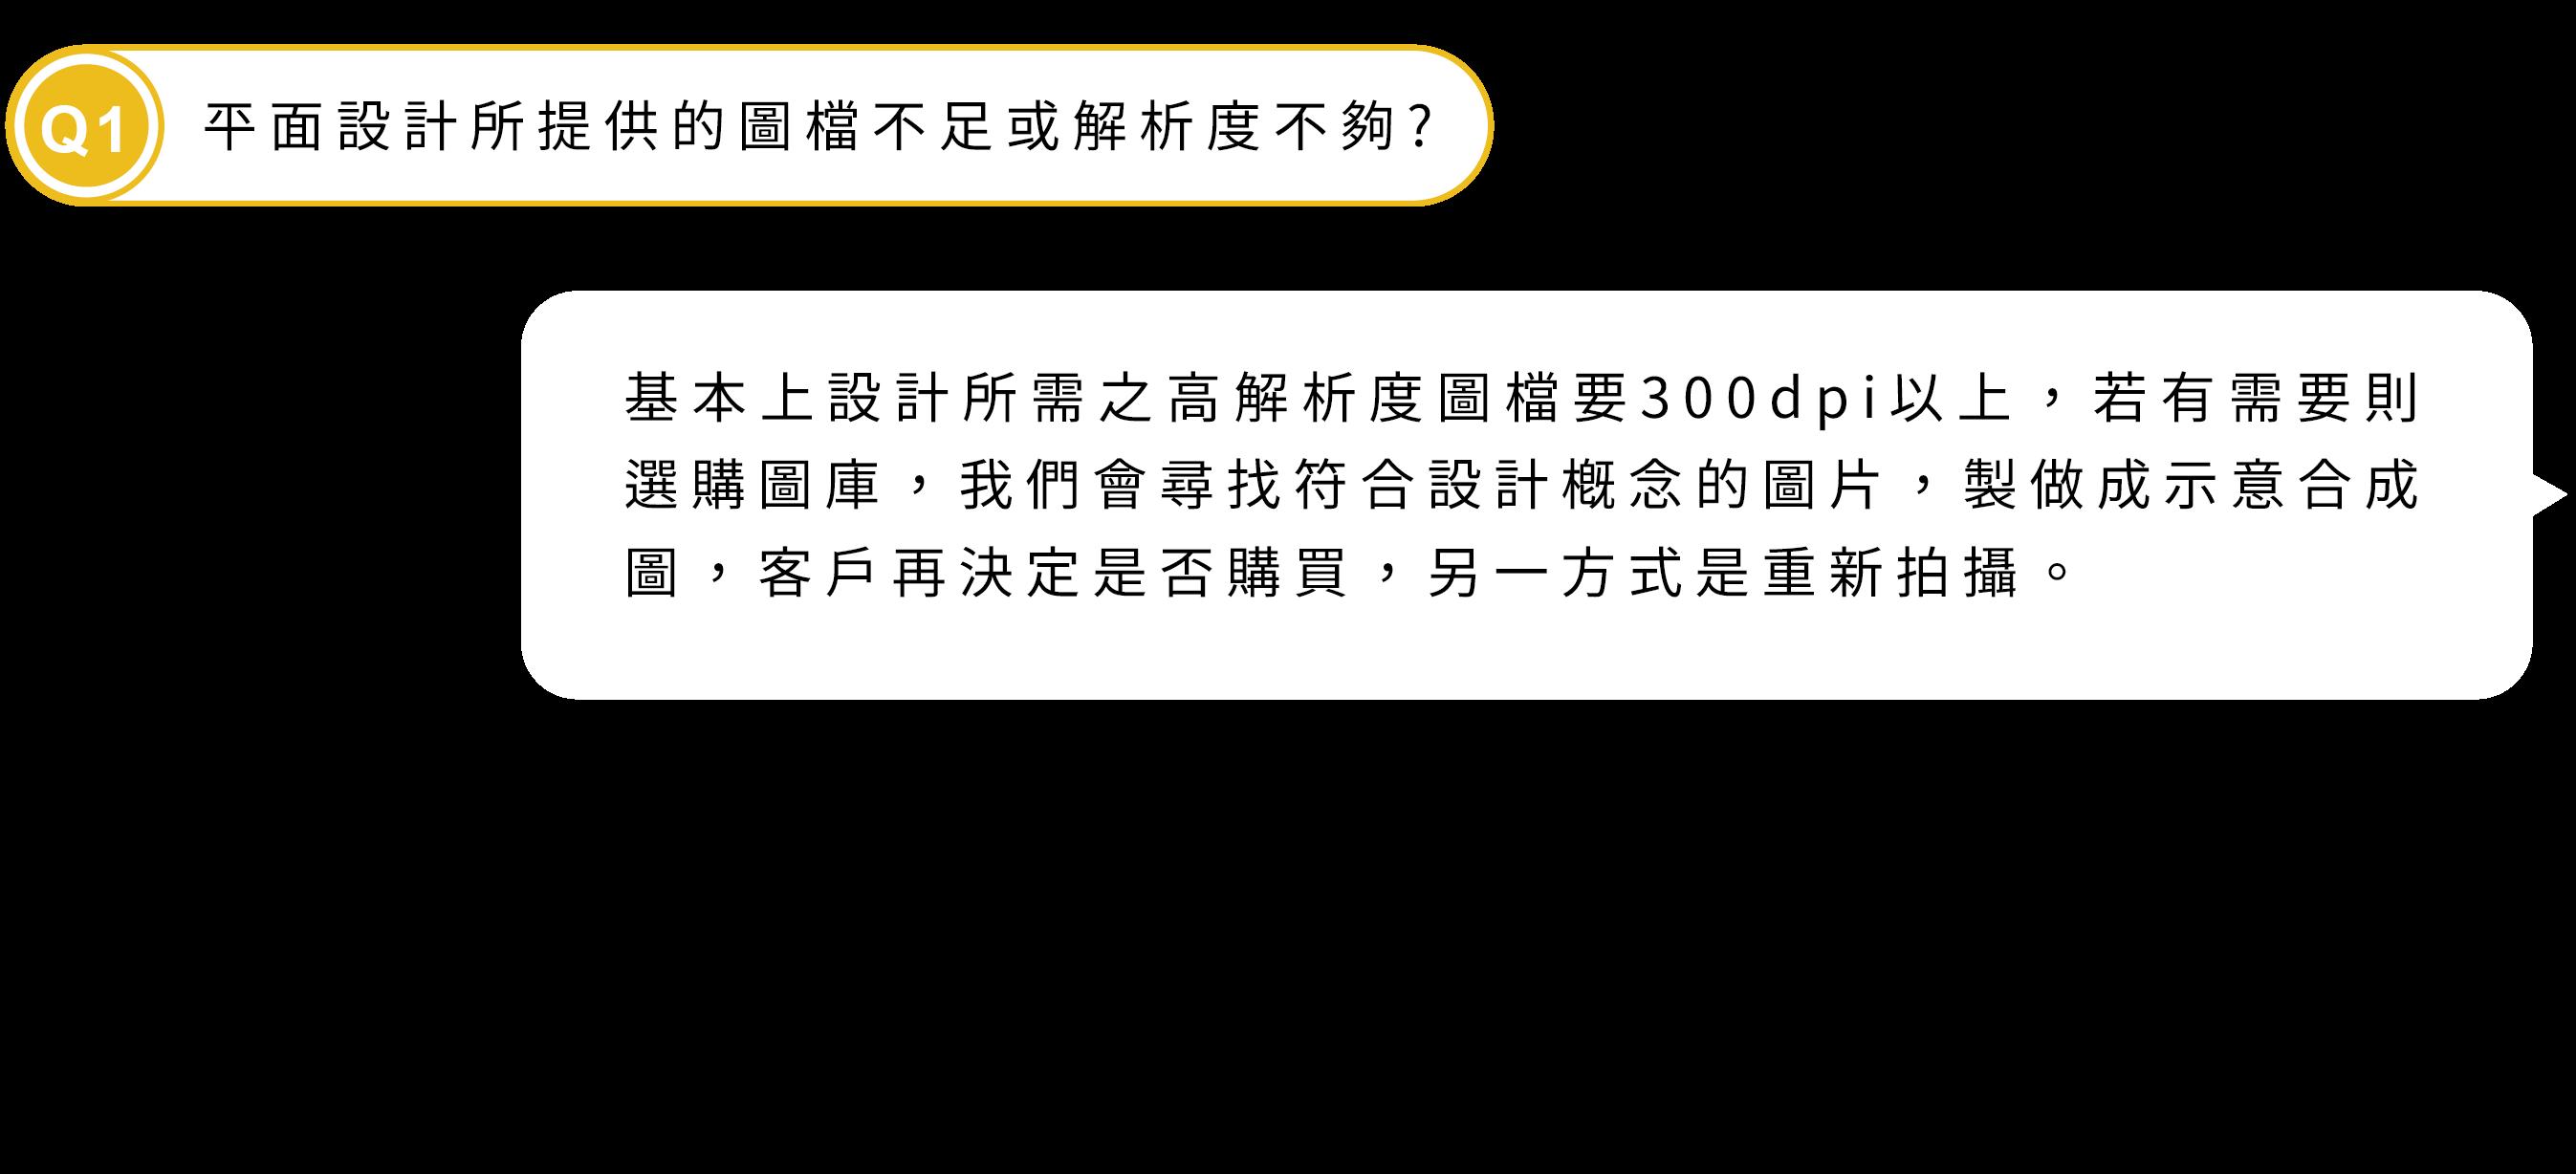 Q1-12 (1)